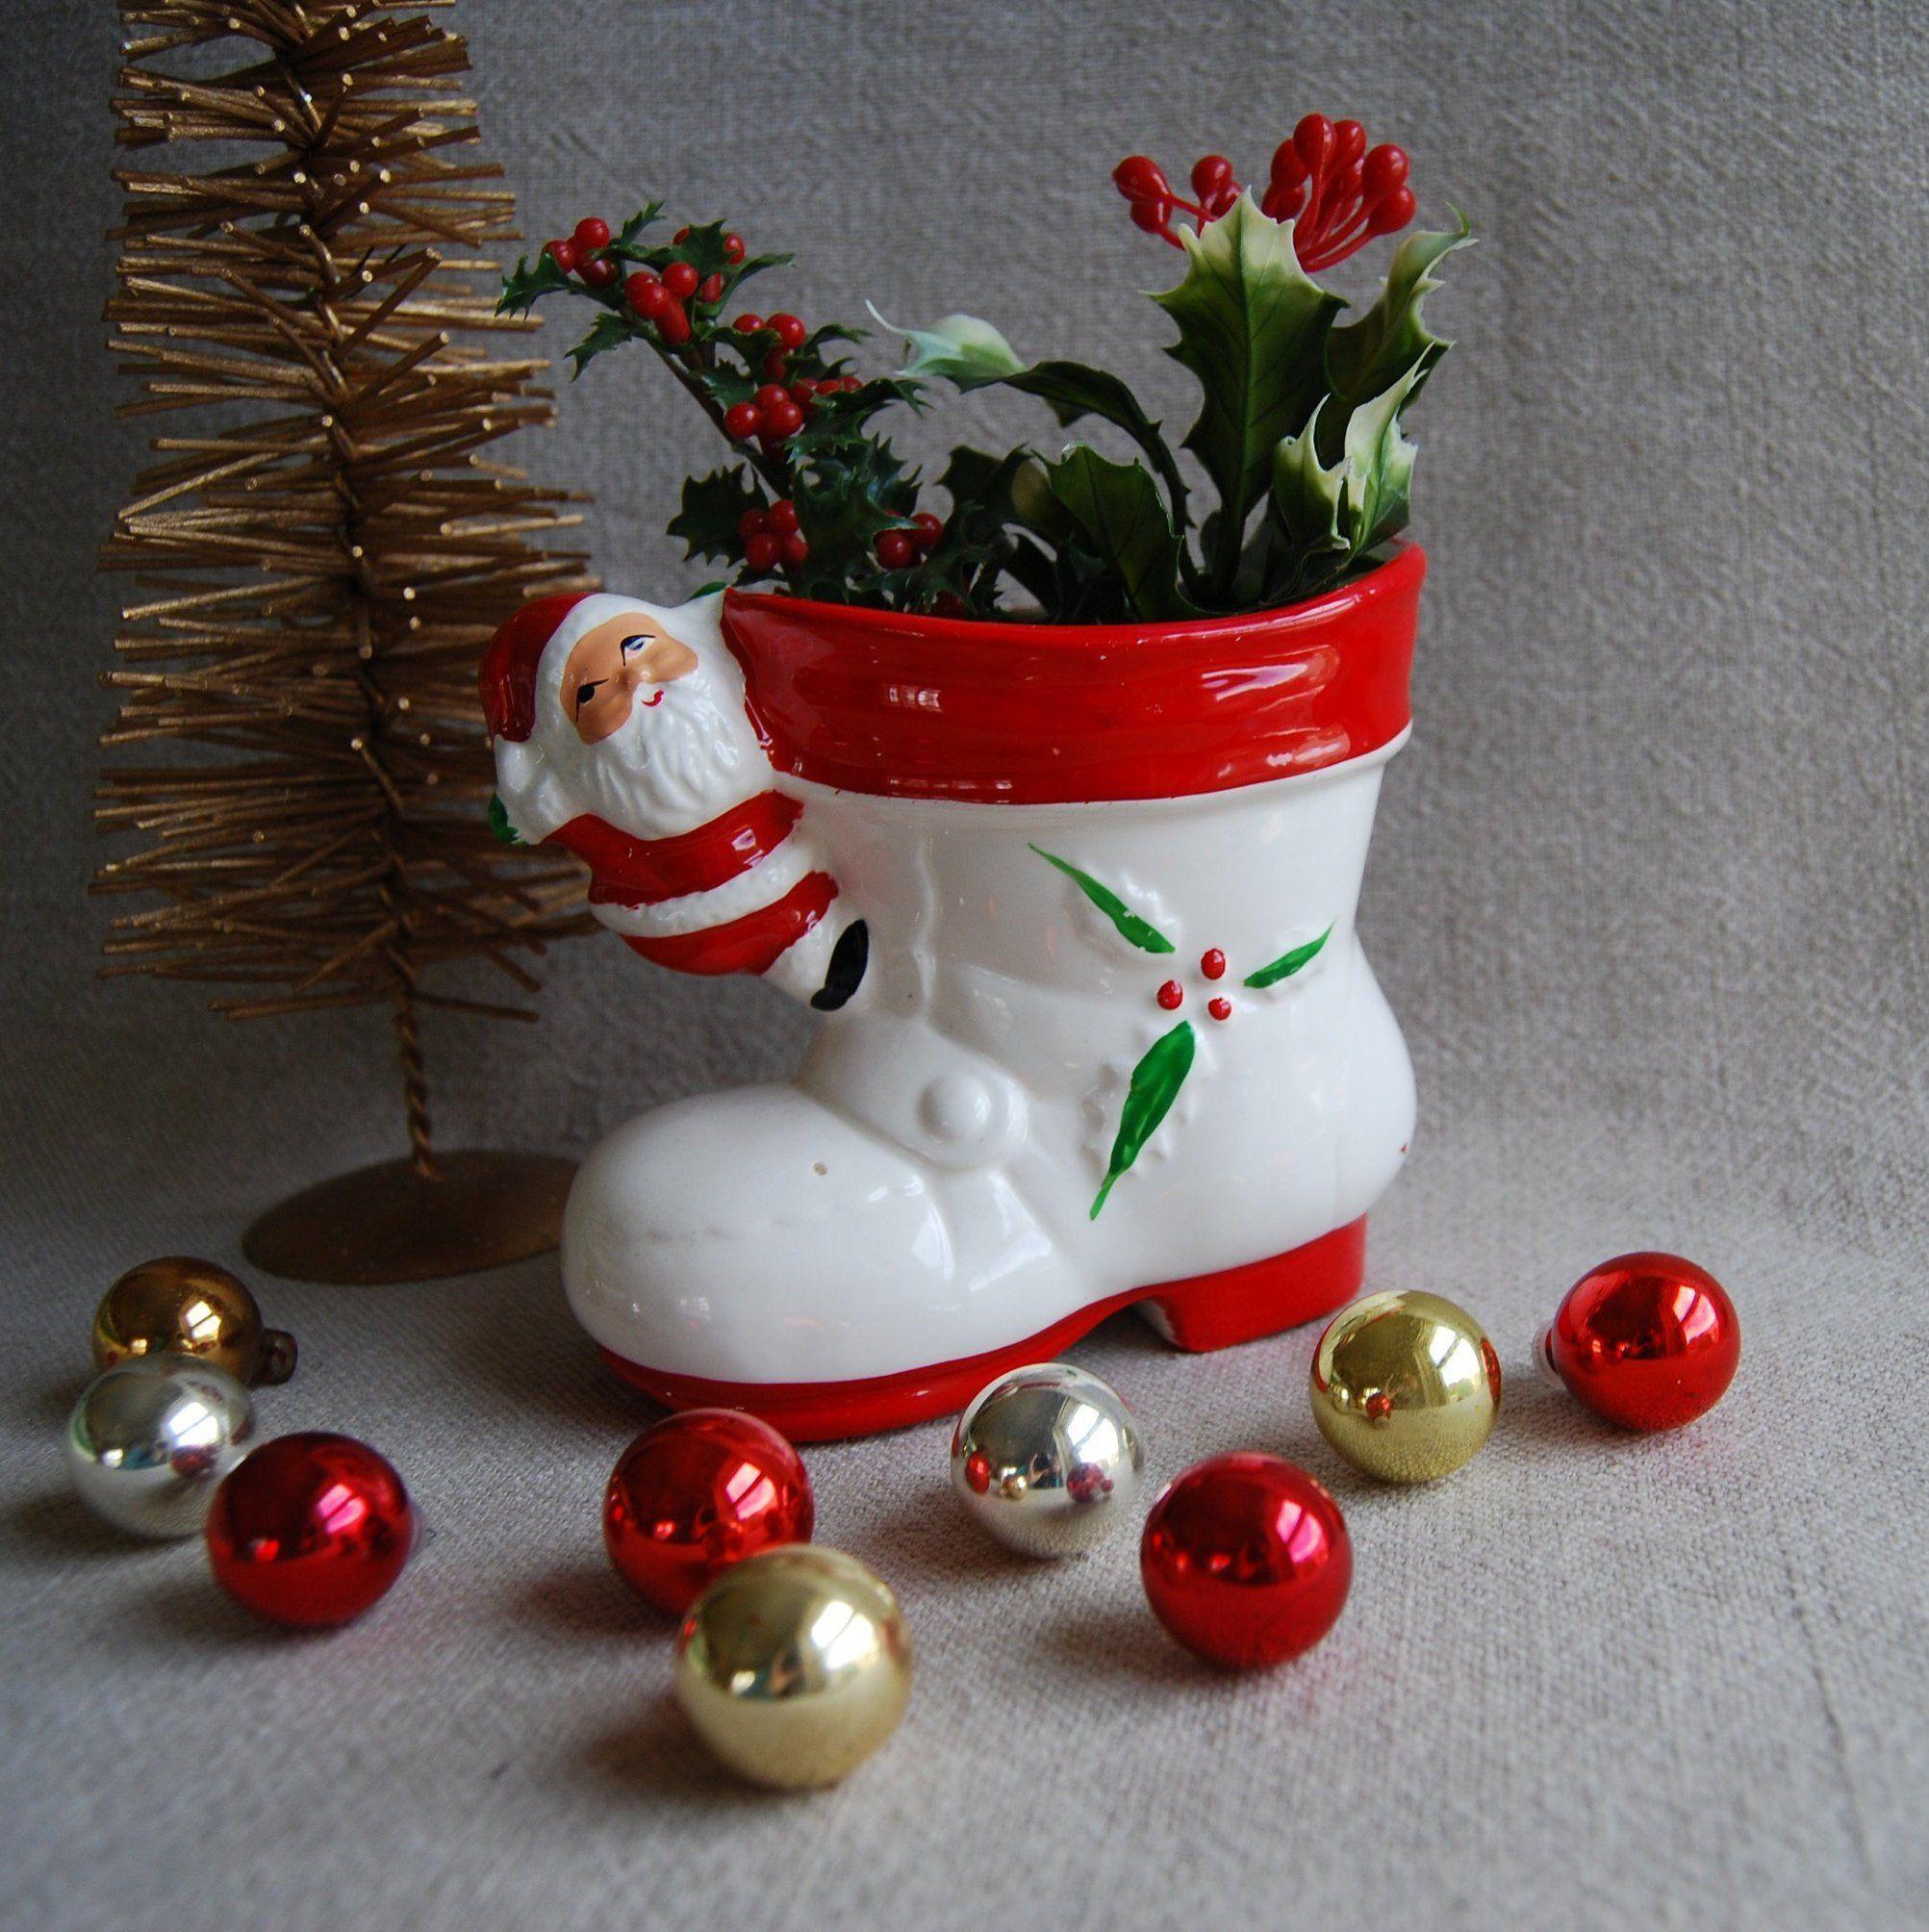 Santa Boot Planter Vintage Santa Claus Christmas Planter Etsy Christmas Planters Vintage Santas Vintage Holiday Decor